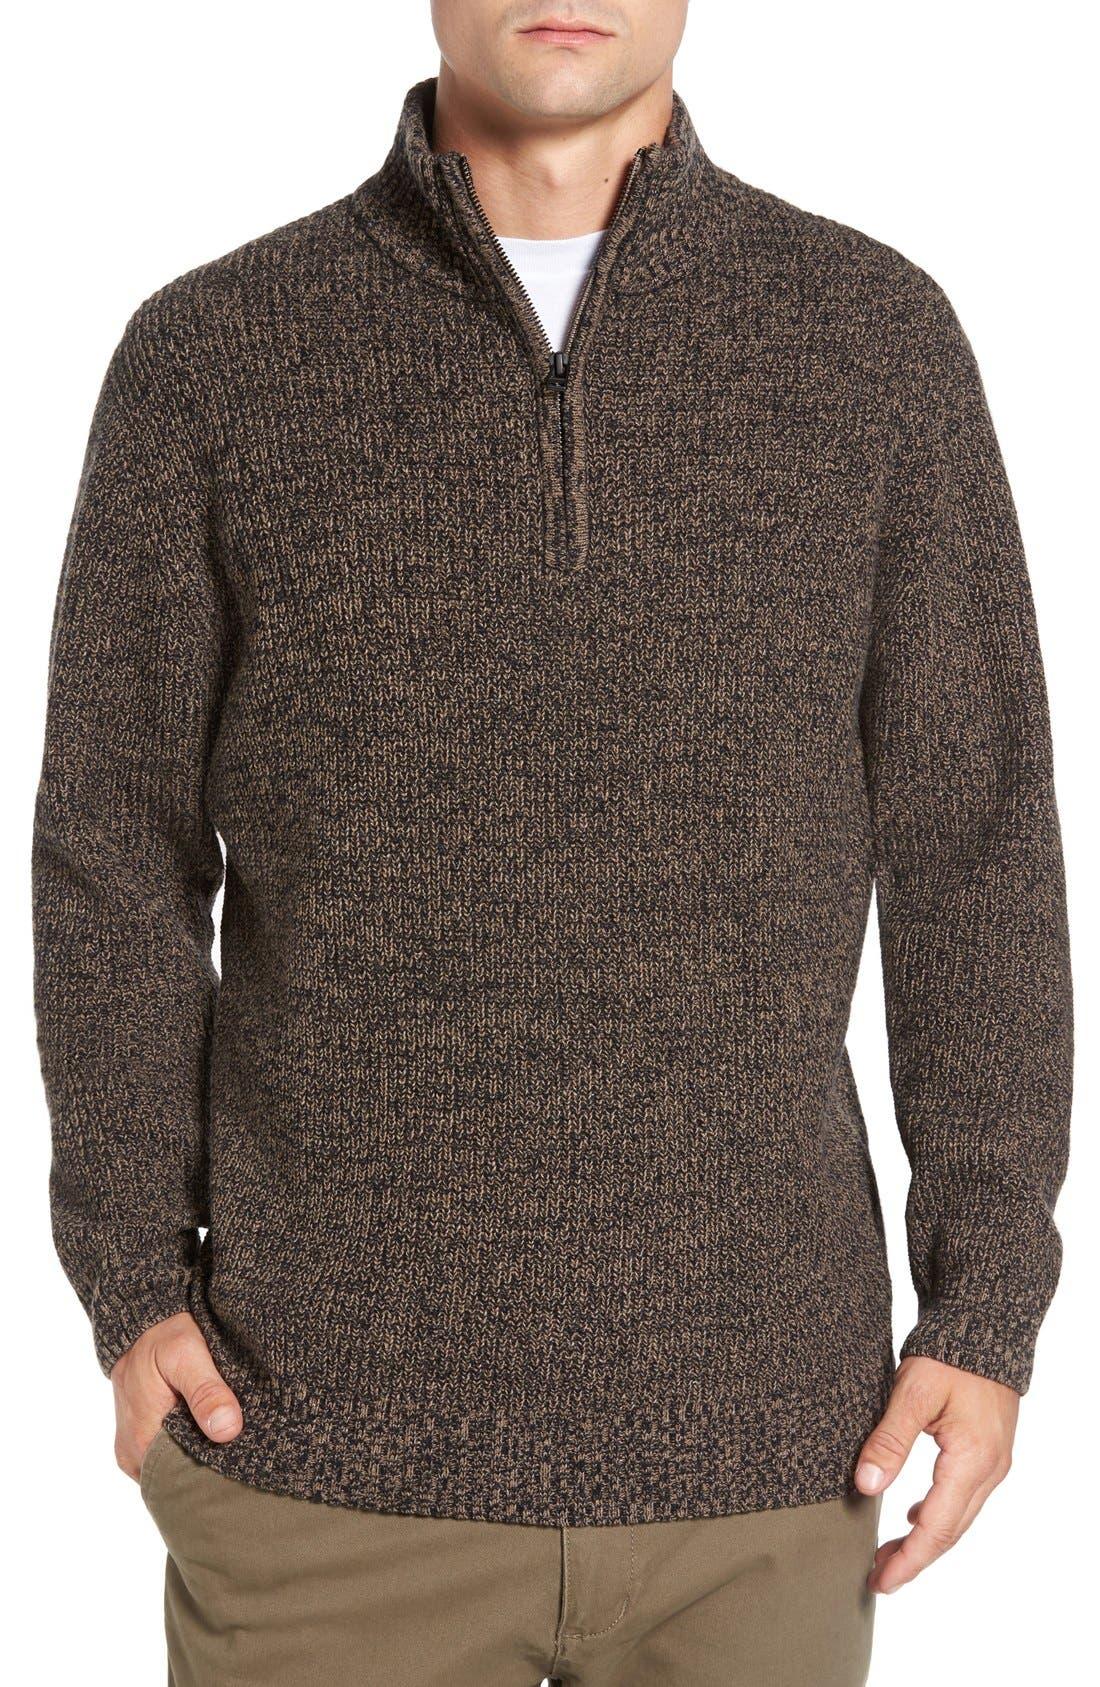 'Woodglen' Herringbone Knit Lambswool Quarter Zip Sweater,                         Main,                         color, Walnut